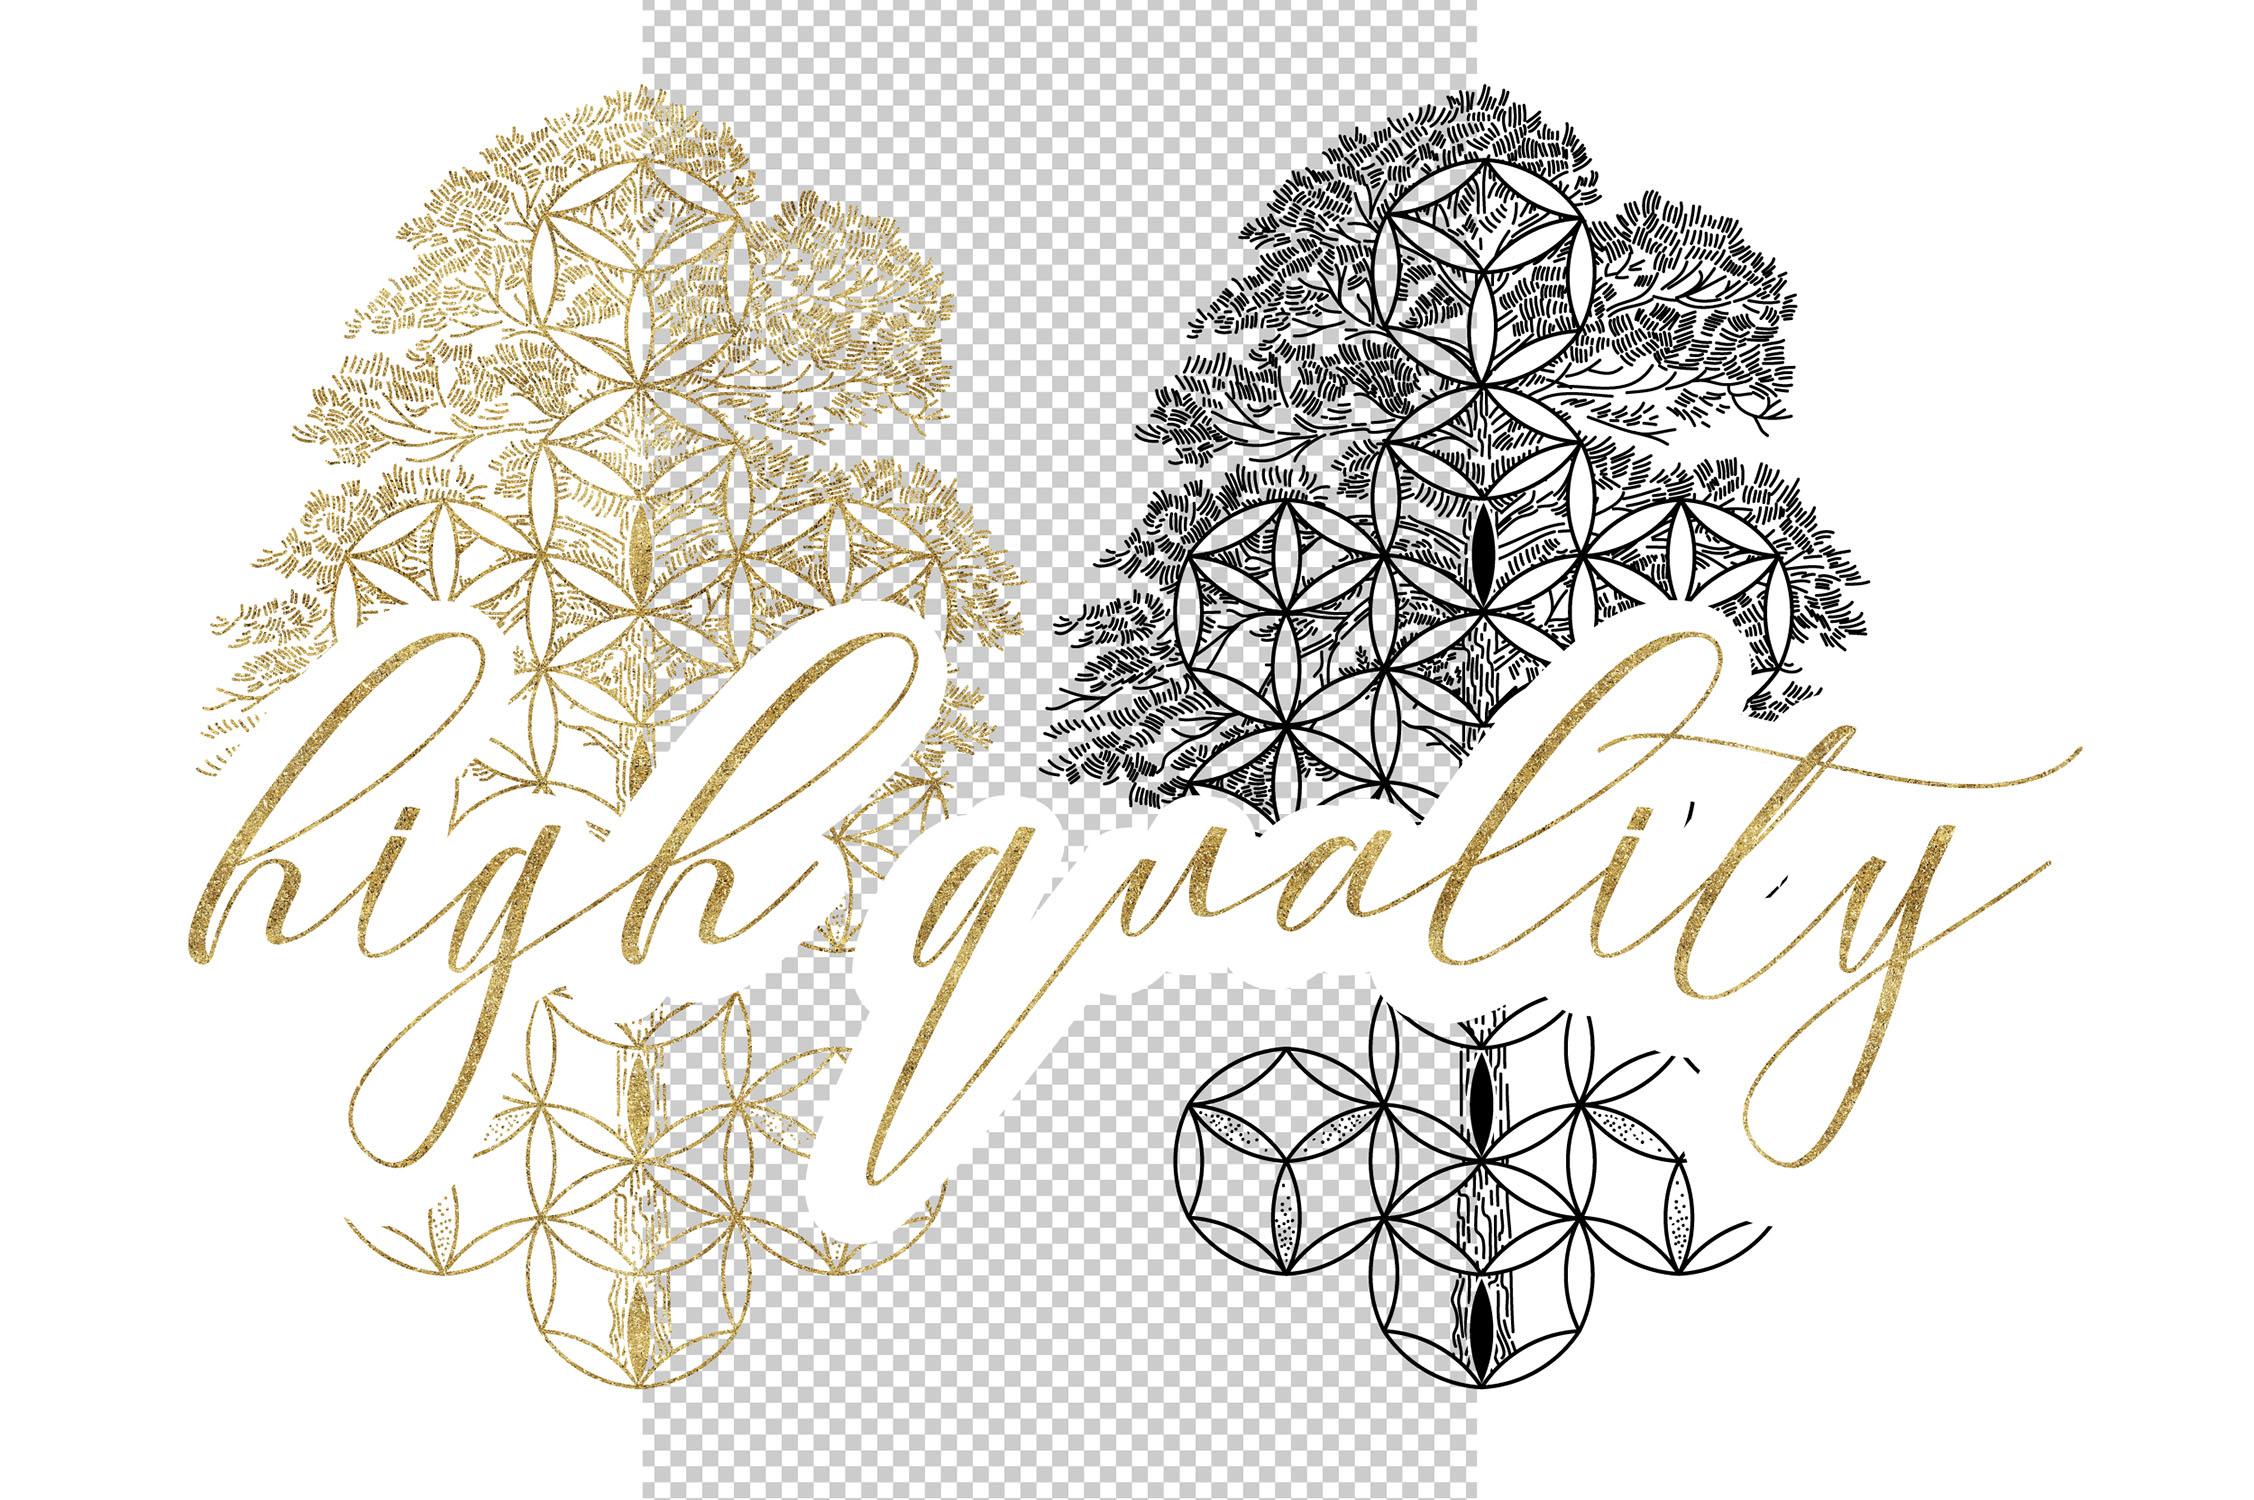 Tree of Life. SVG|PNG|Ai|JPEG example image 2